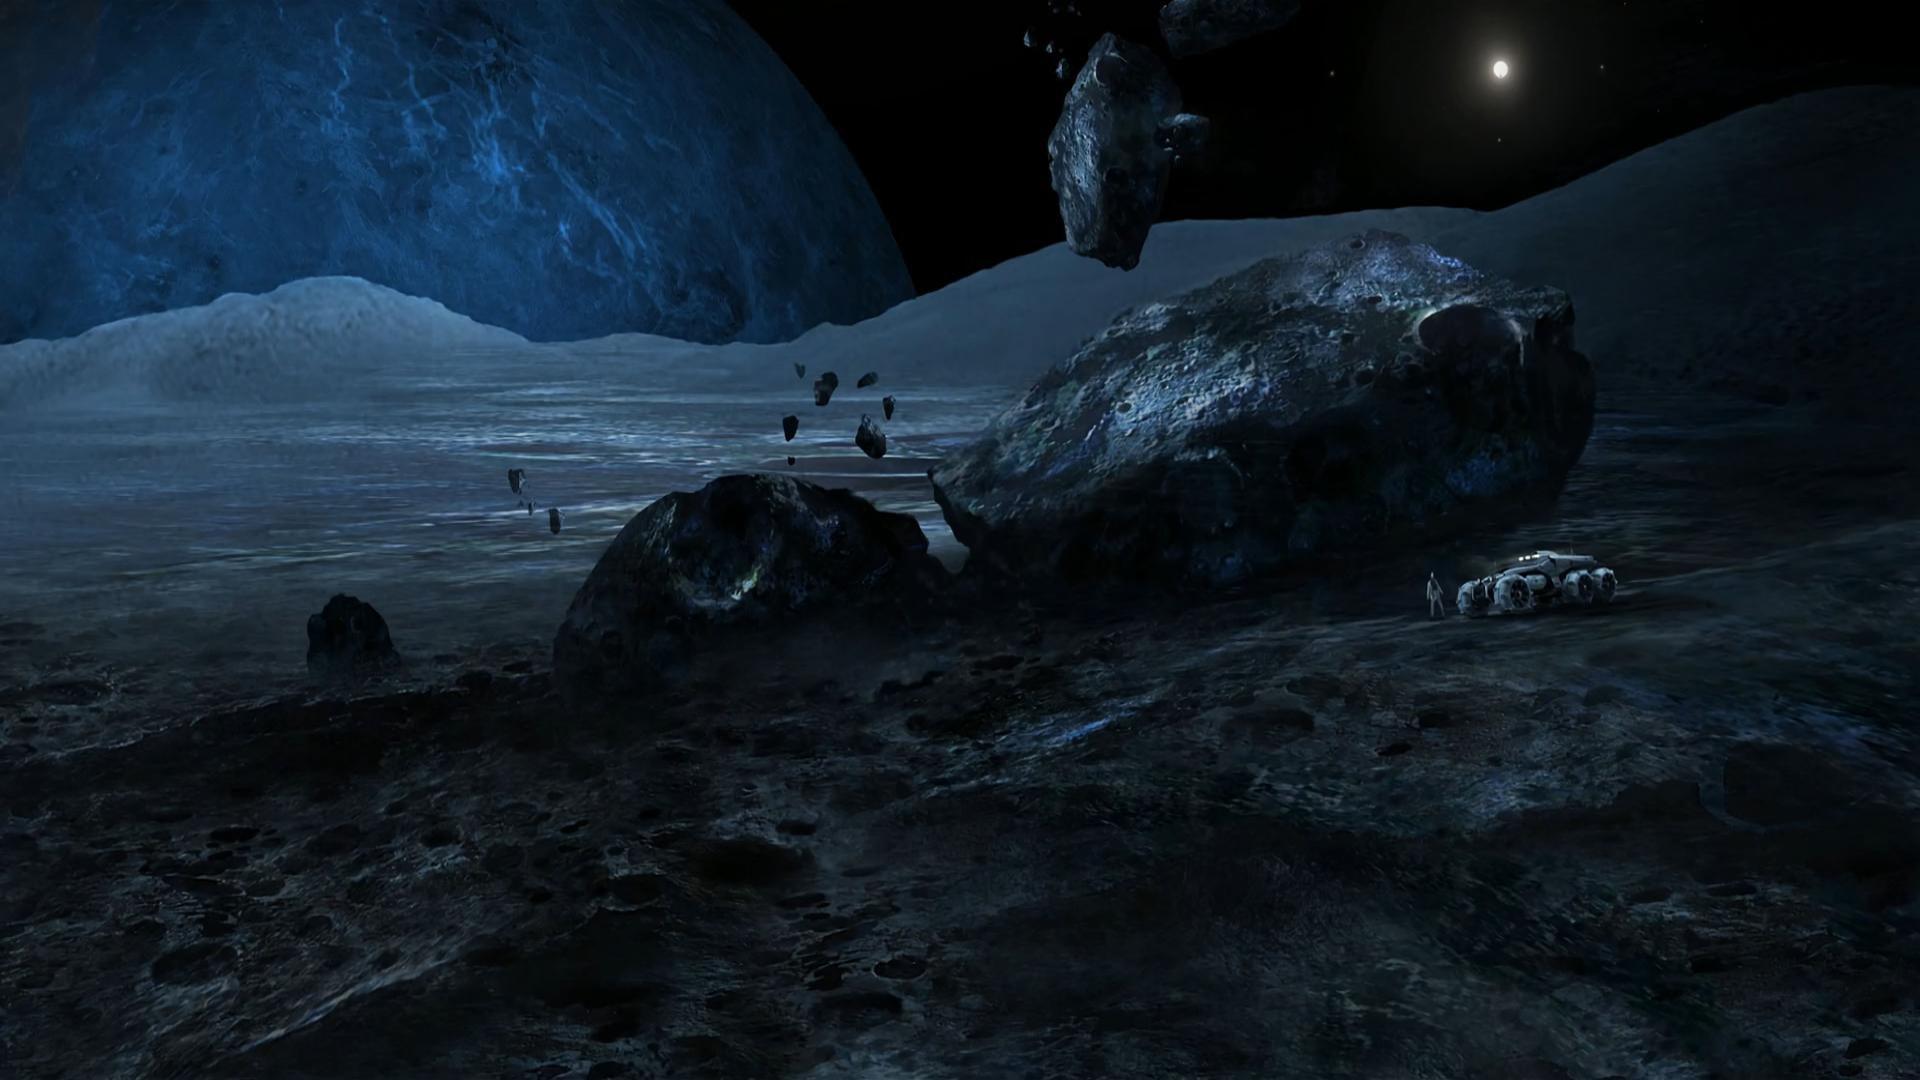 Mass Effect Andromeda Wallpapers Hd For Desktop Backgrounds